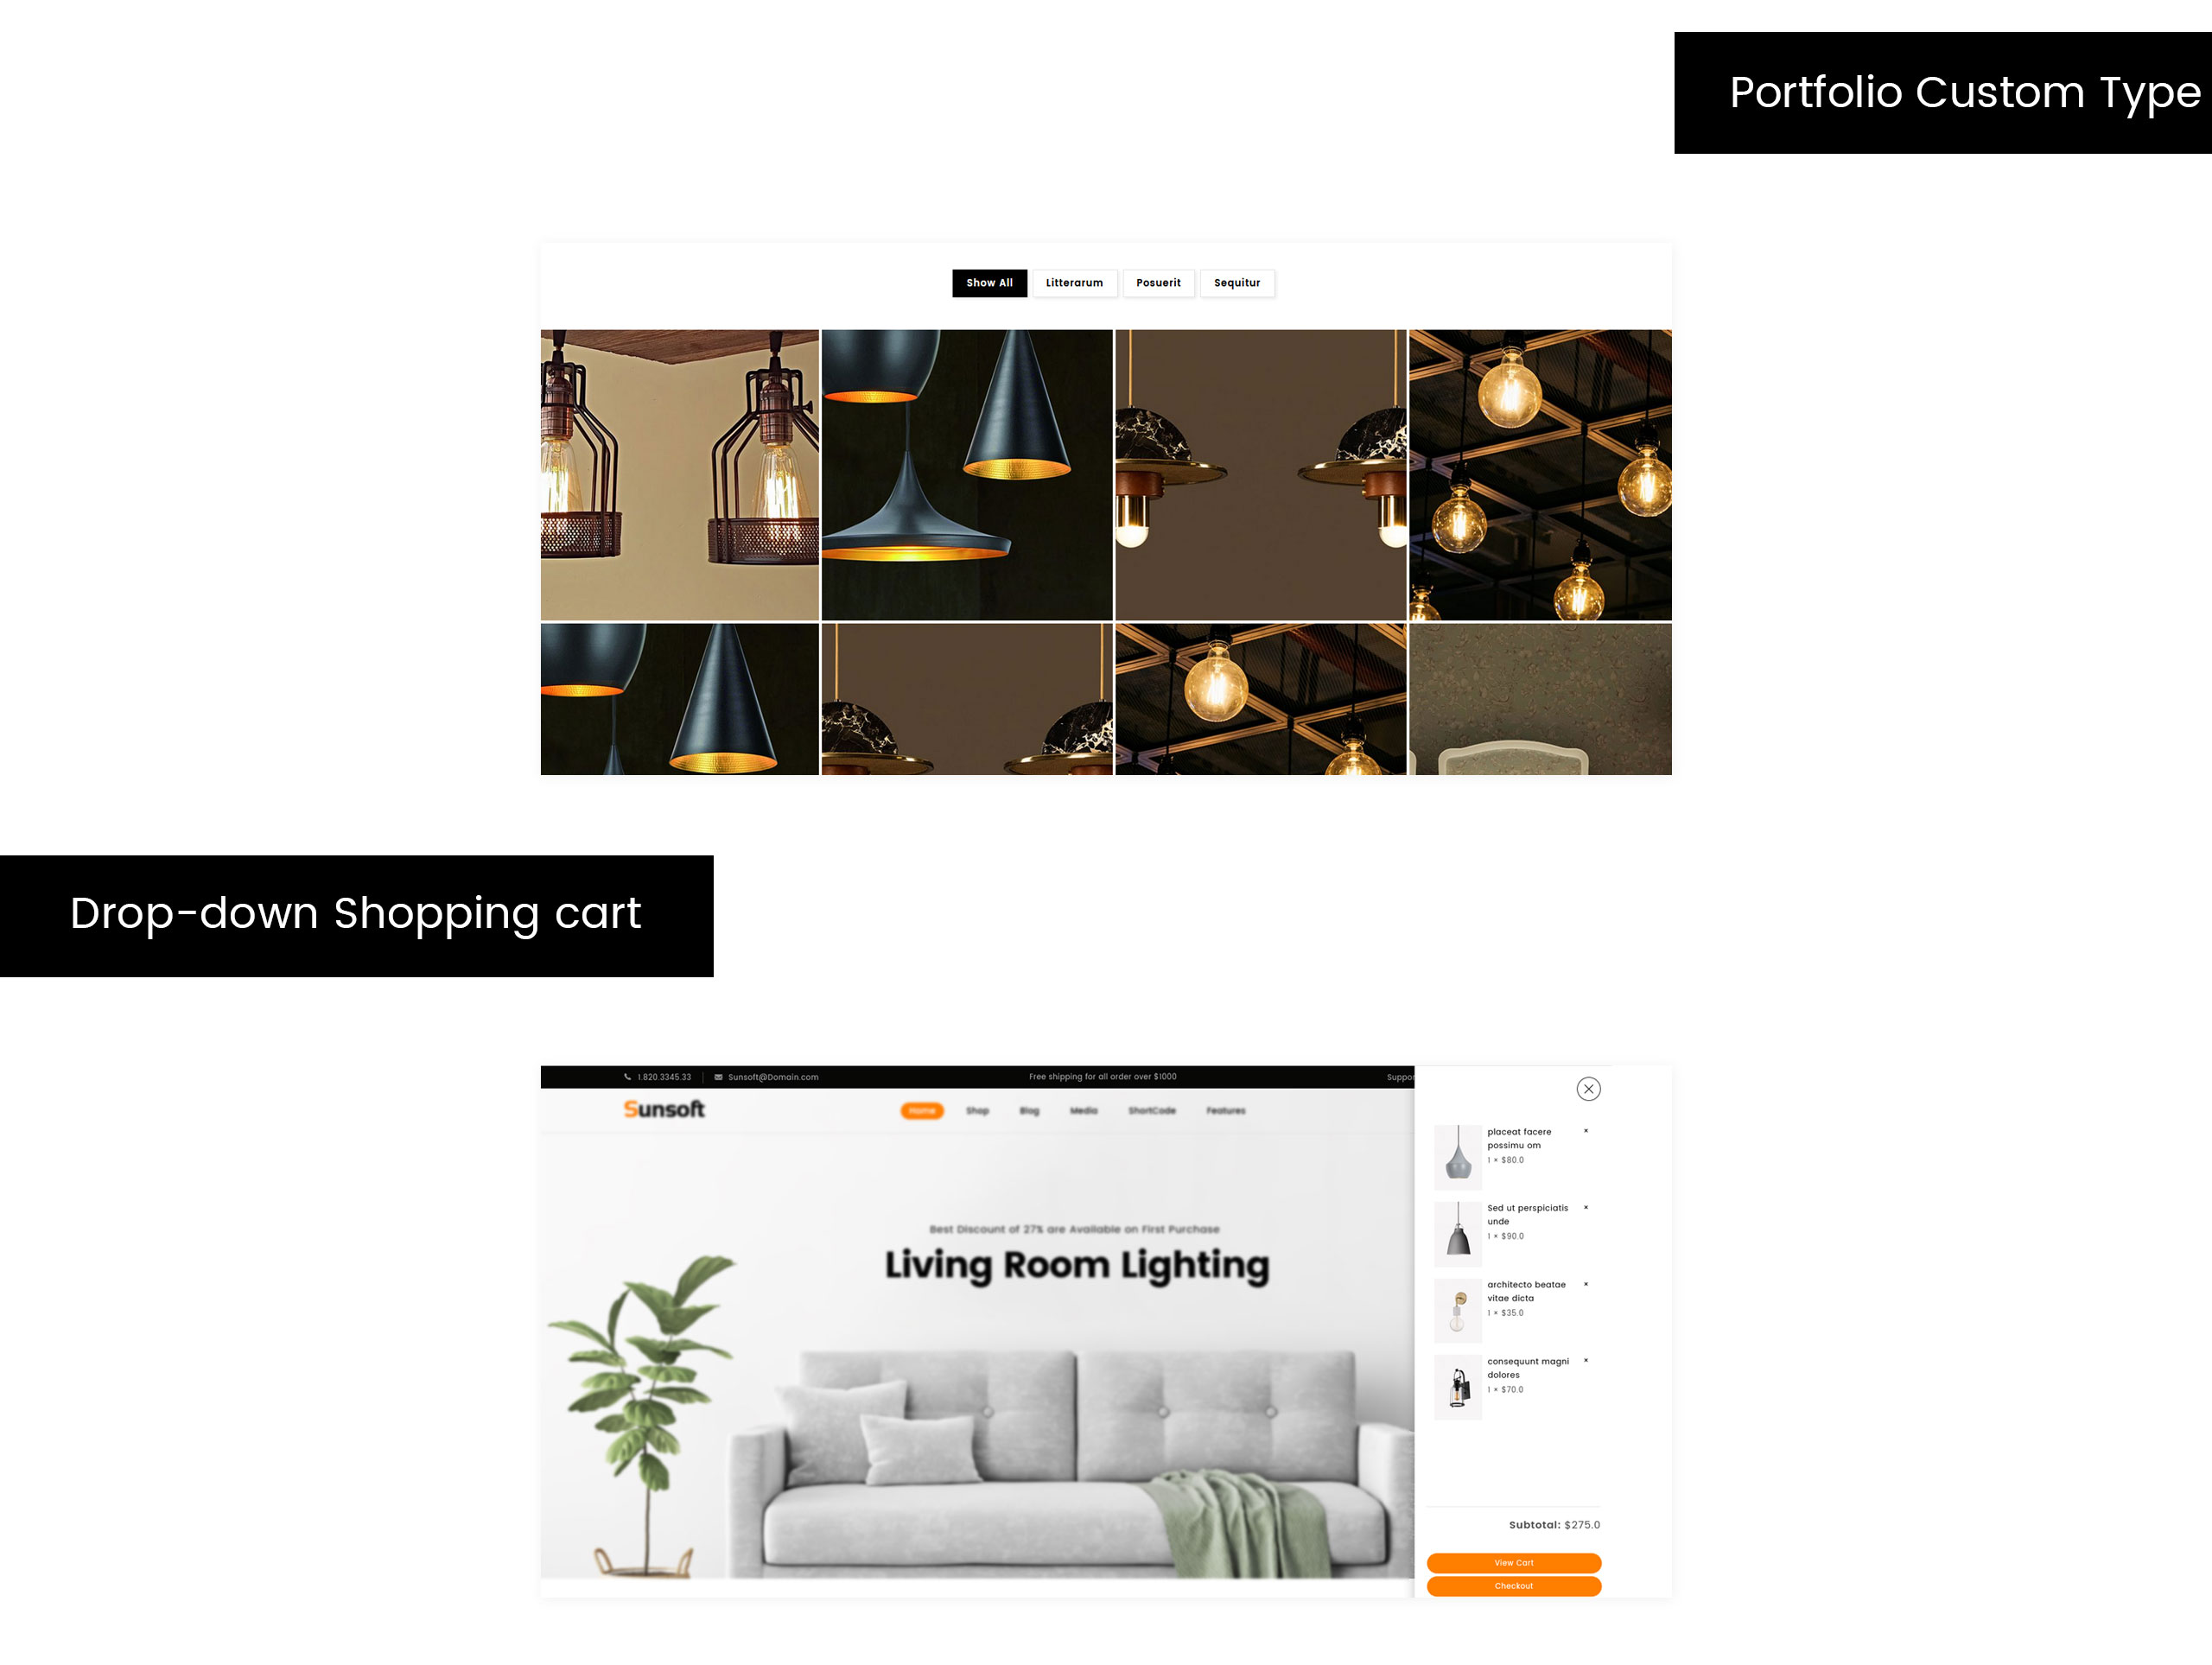 Sunsoft - Lighting Store WooCommerce Theme